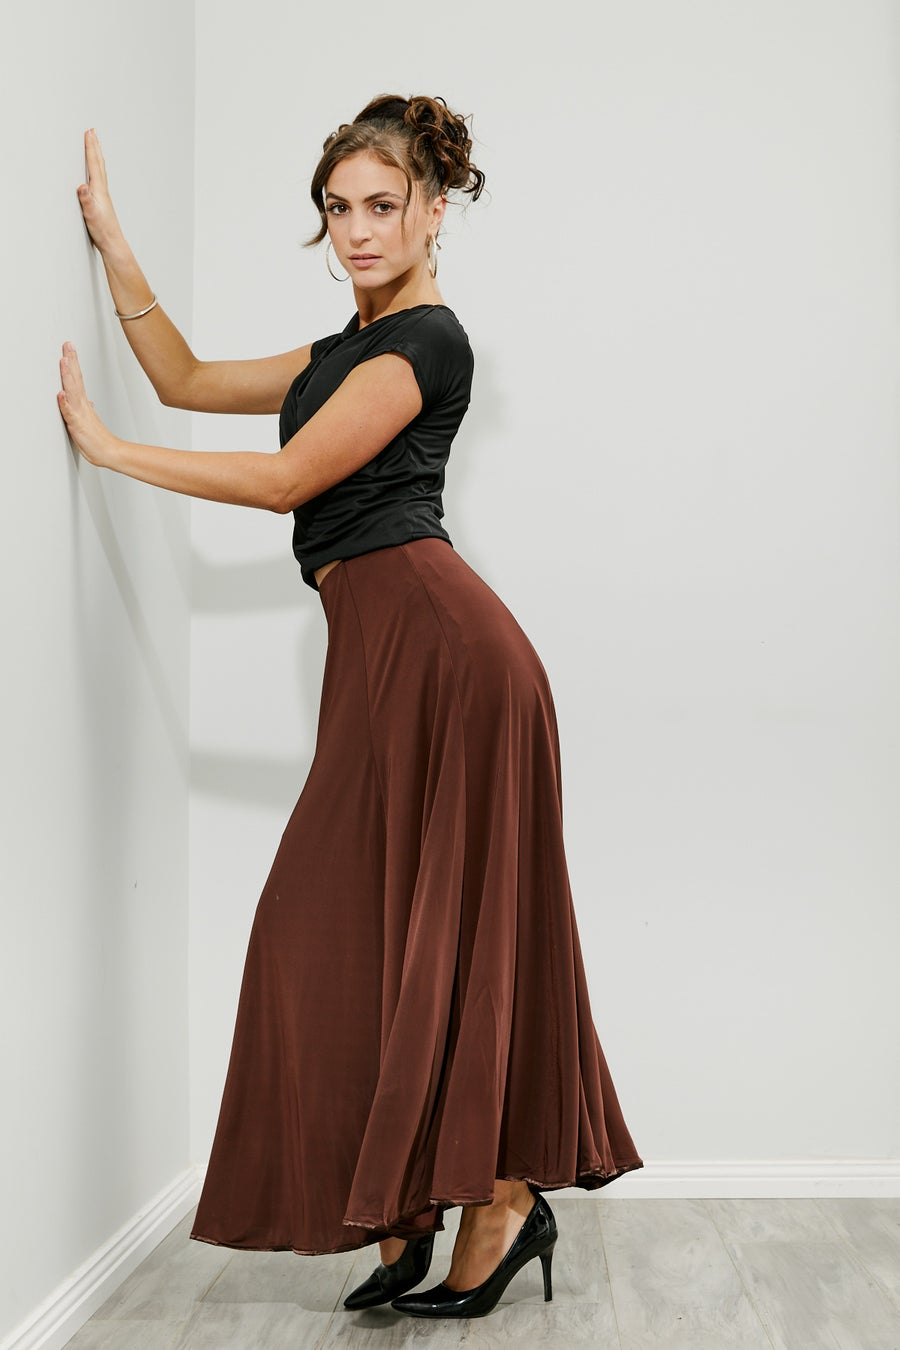 Image of Ballroom Panel Skirt - Choco (J3196) Dancewear latin ballroom